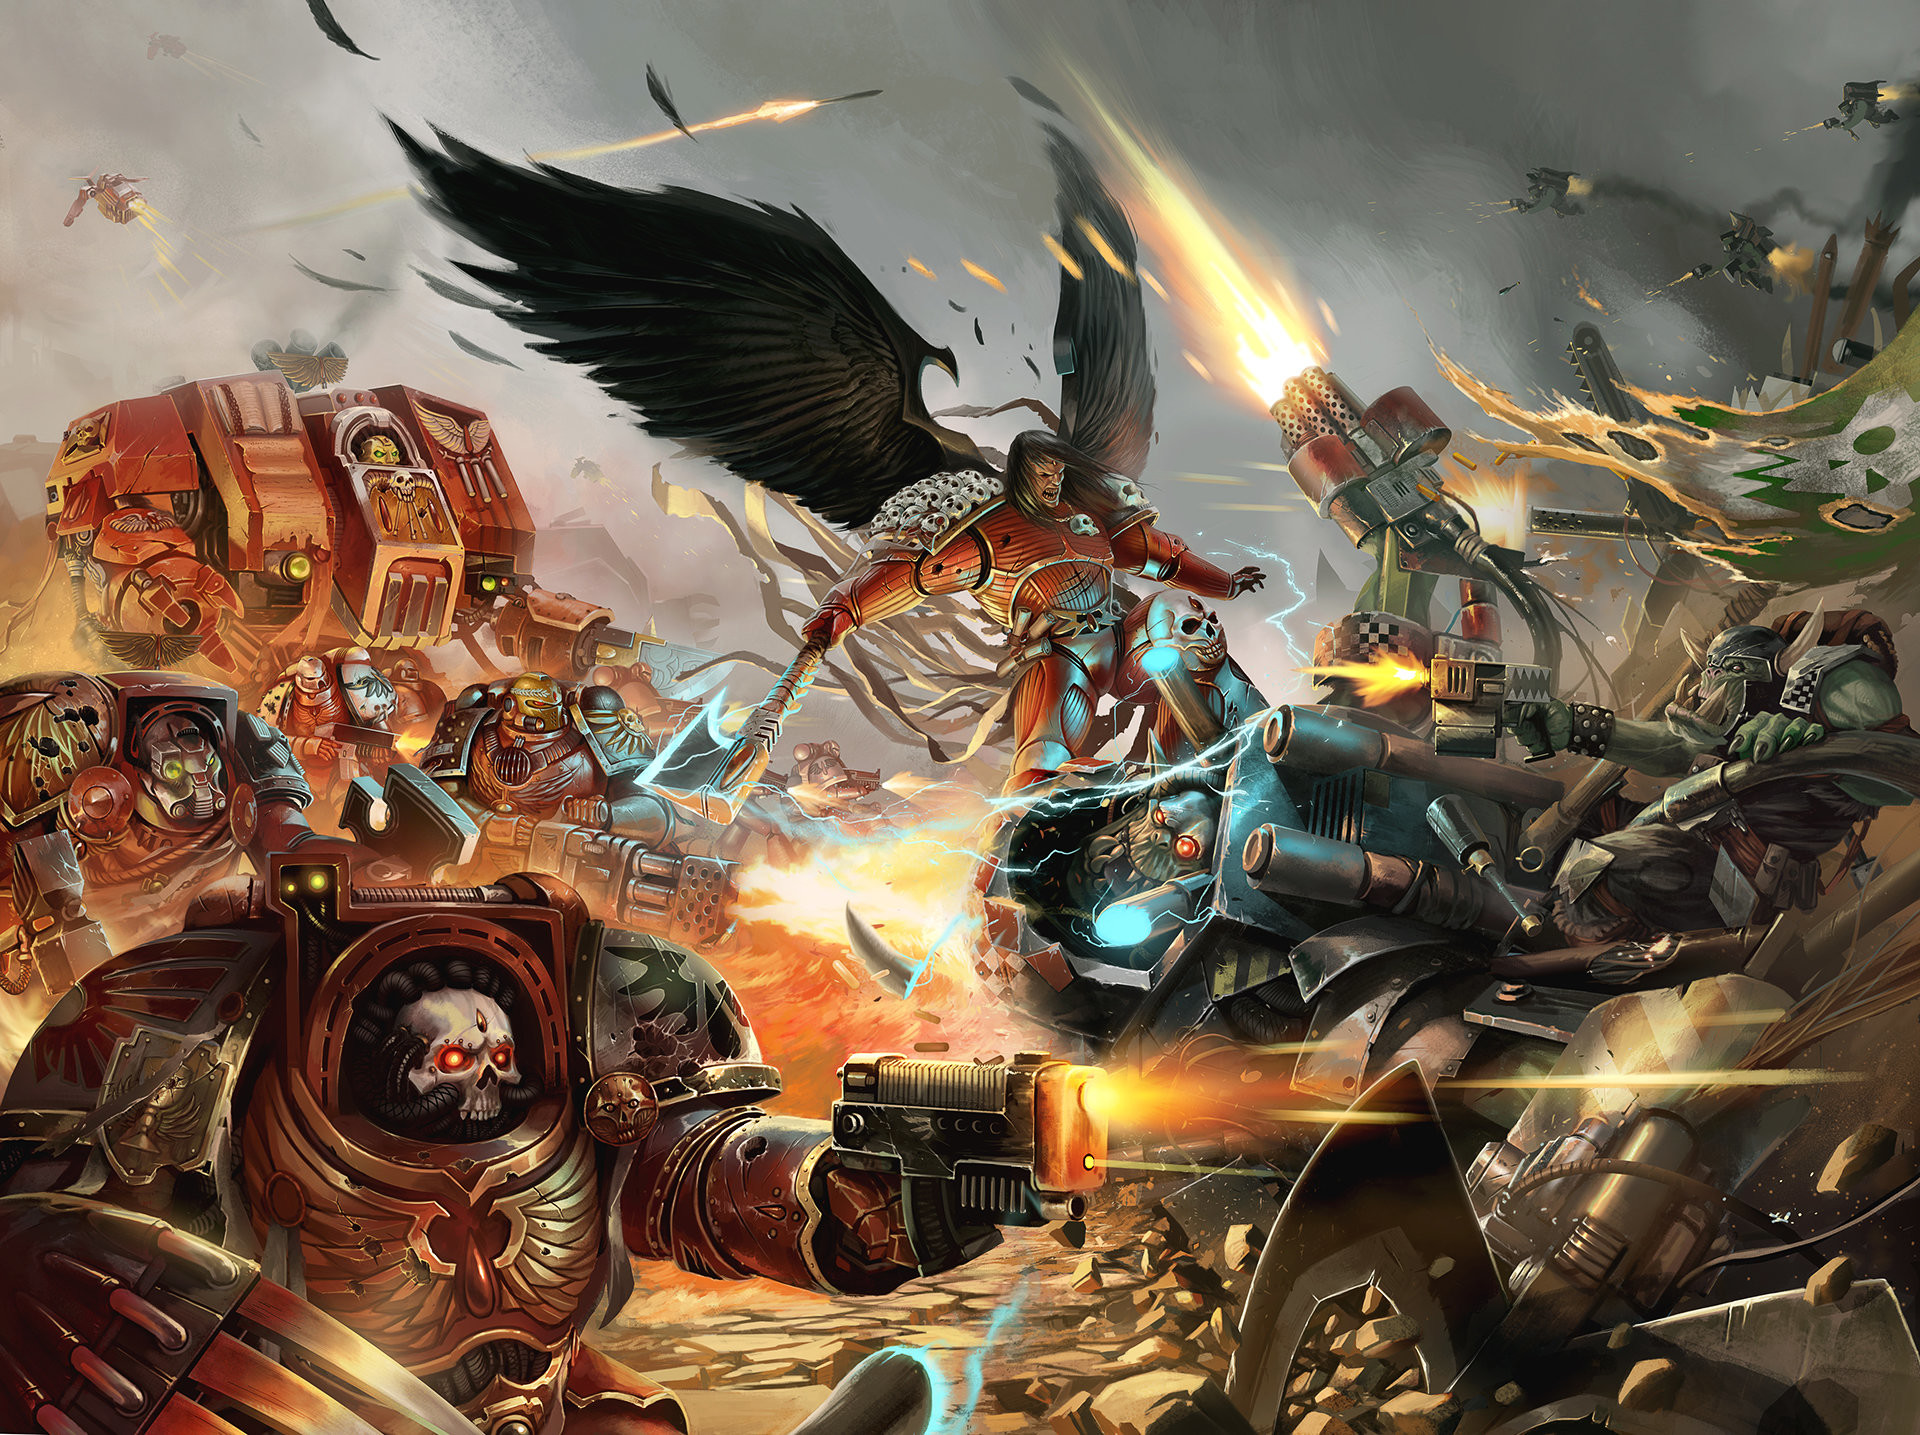 Warhammer 40k death company wallpaper - 1920x1080 Warhammer 40k Wallpaper 1920x1080 Warhammer 40k Space Marines Dawn